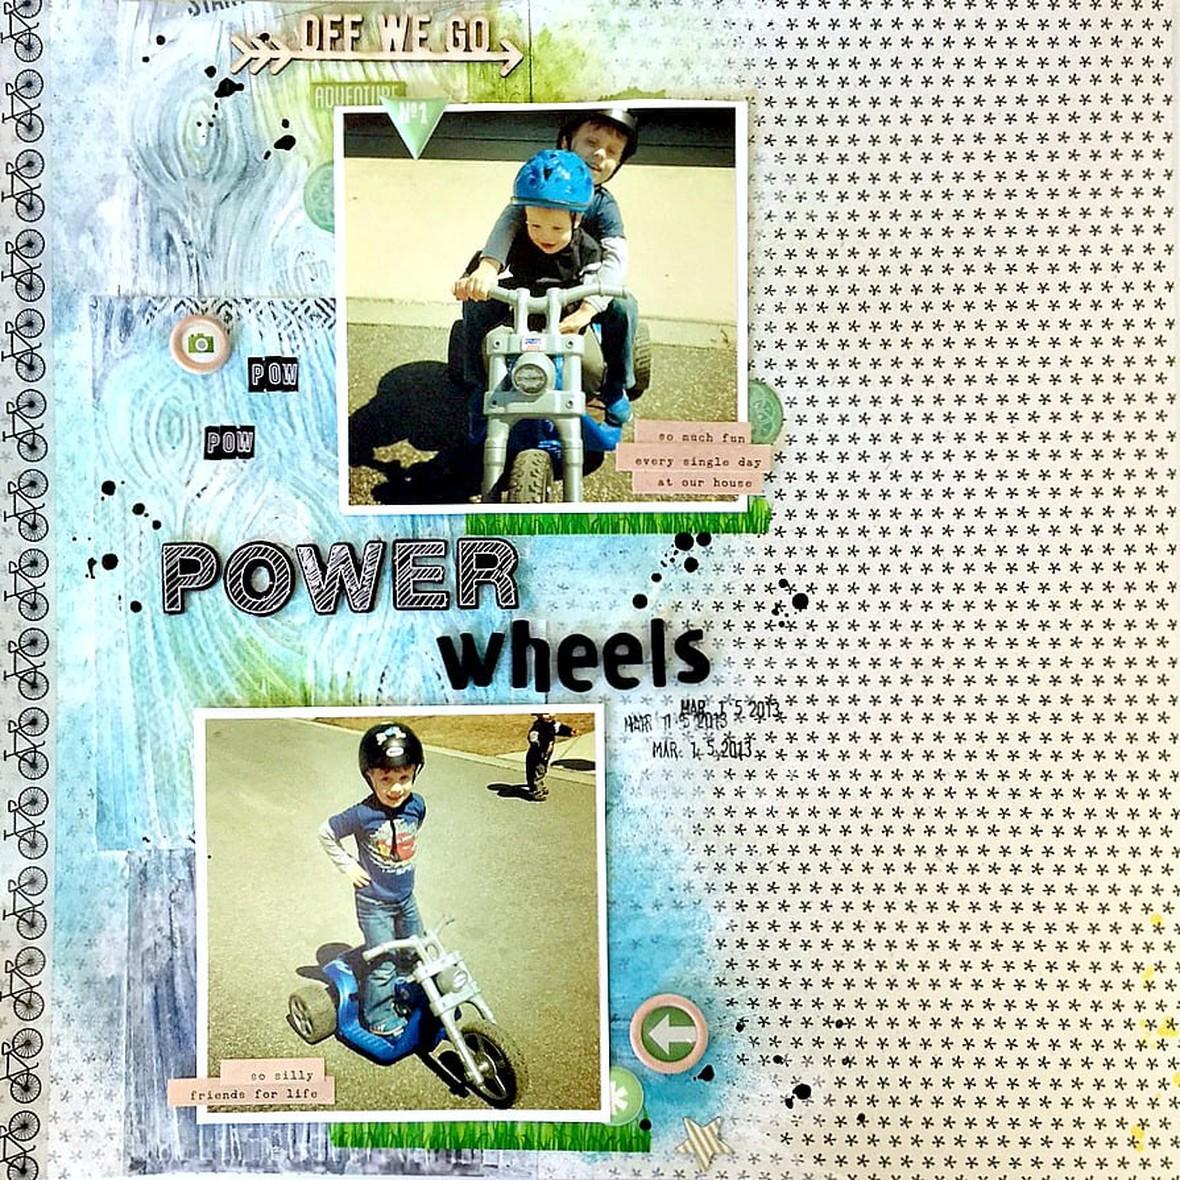 Pow pow power wheels layout   ls original